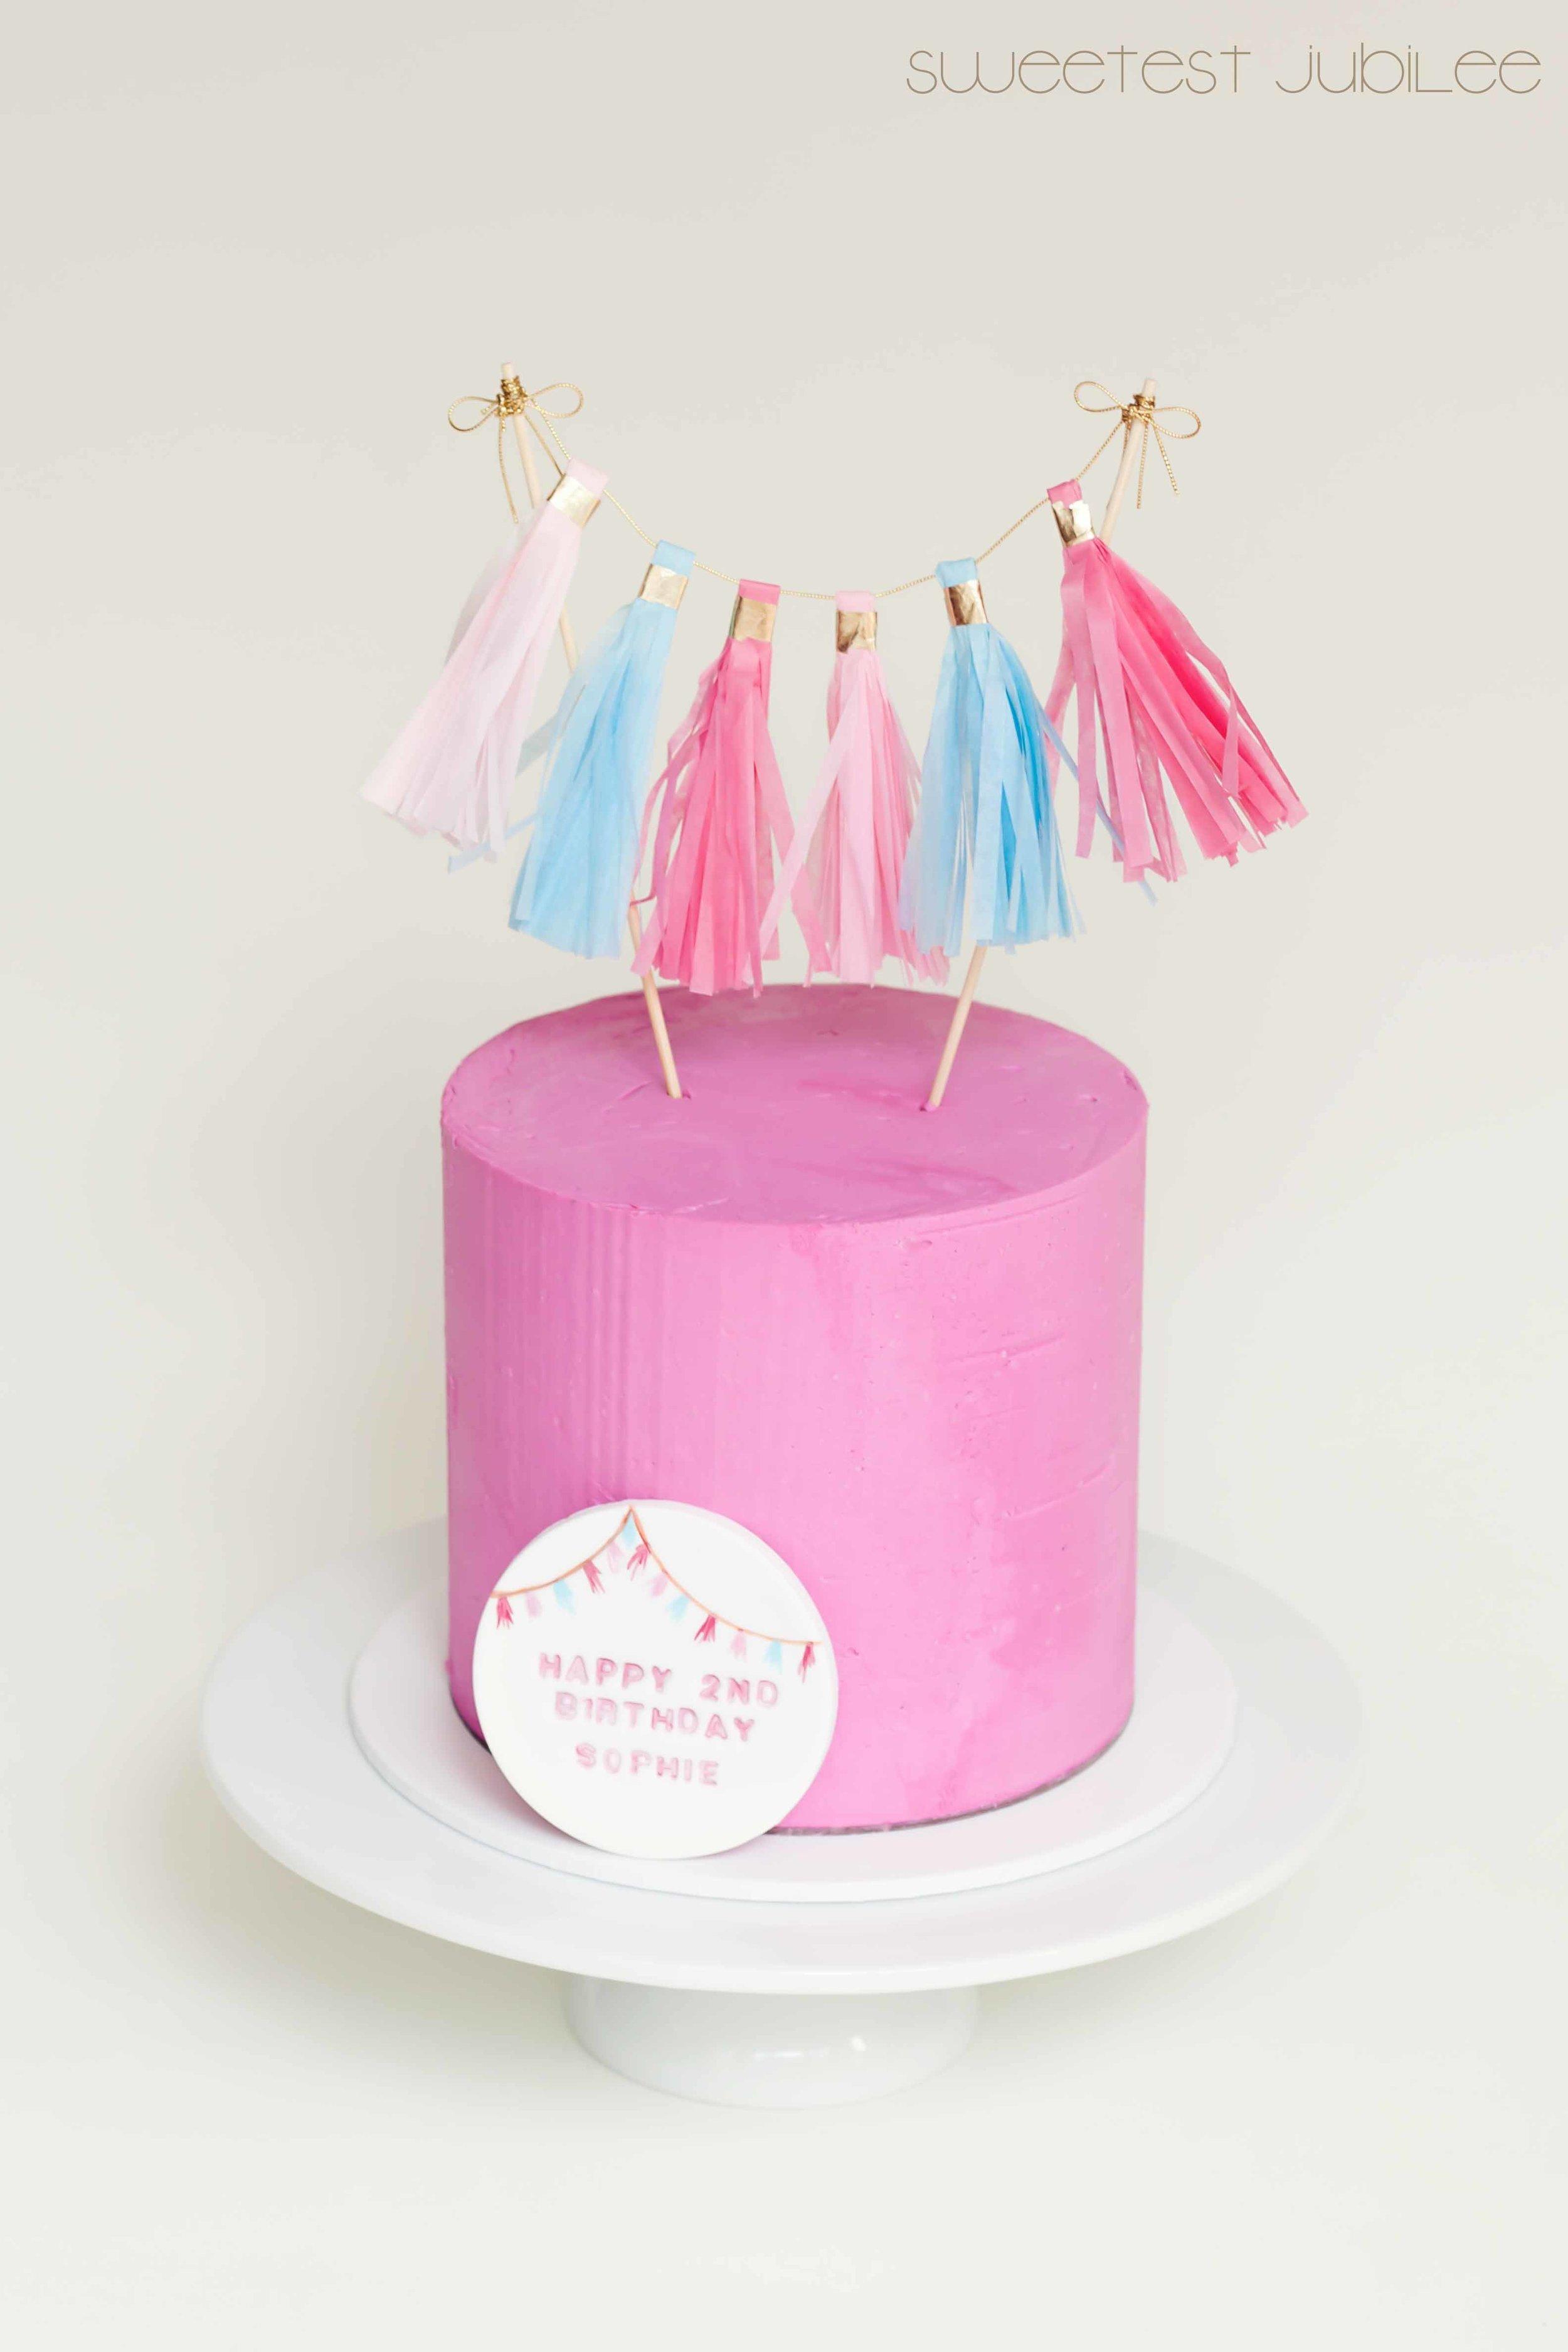 Sophie cake.jpg